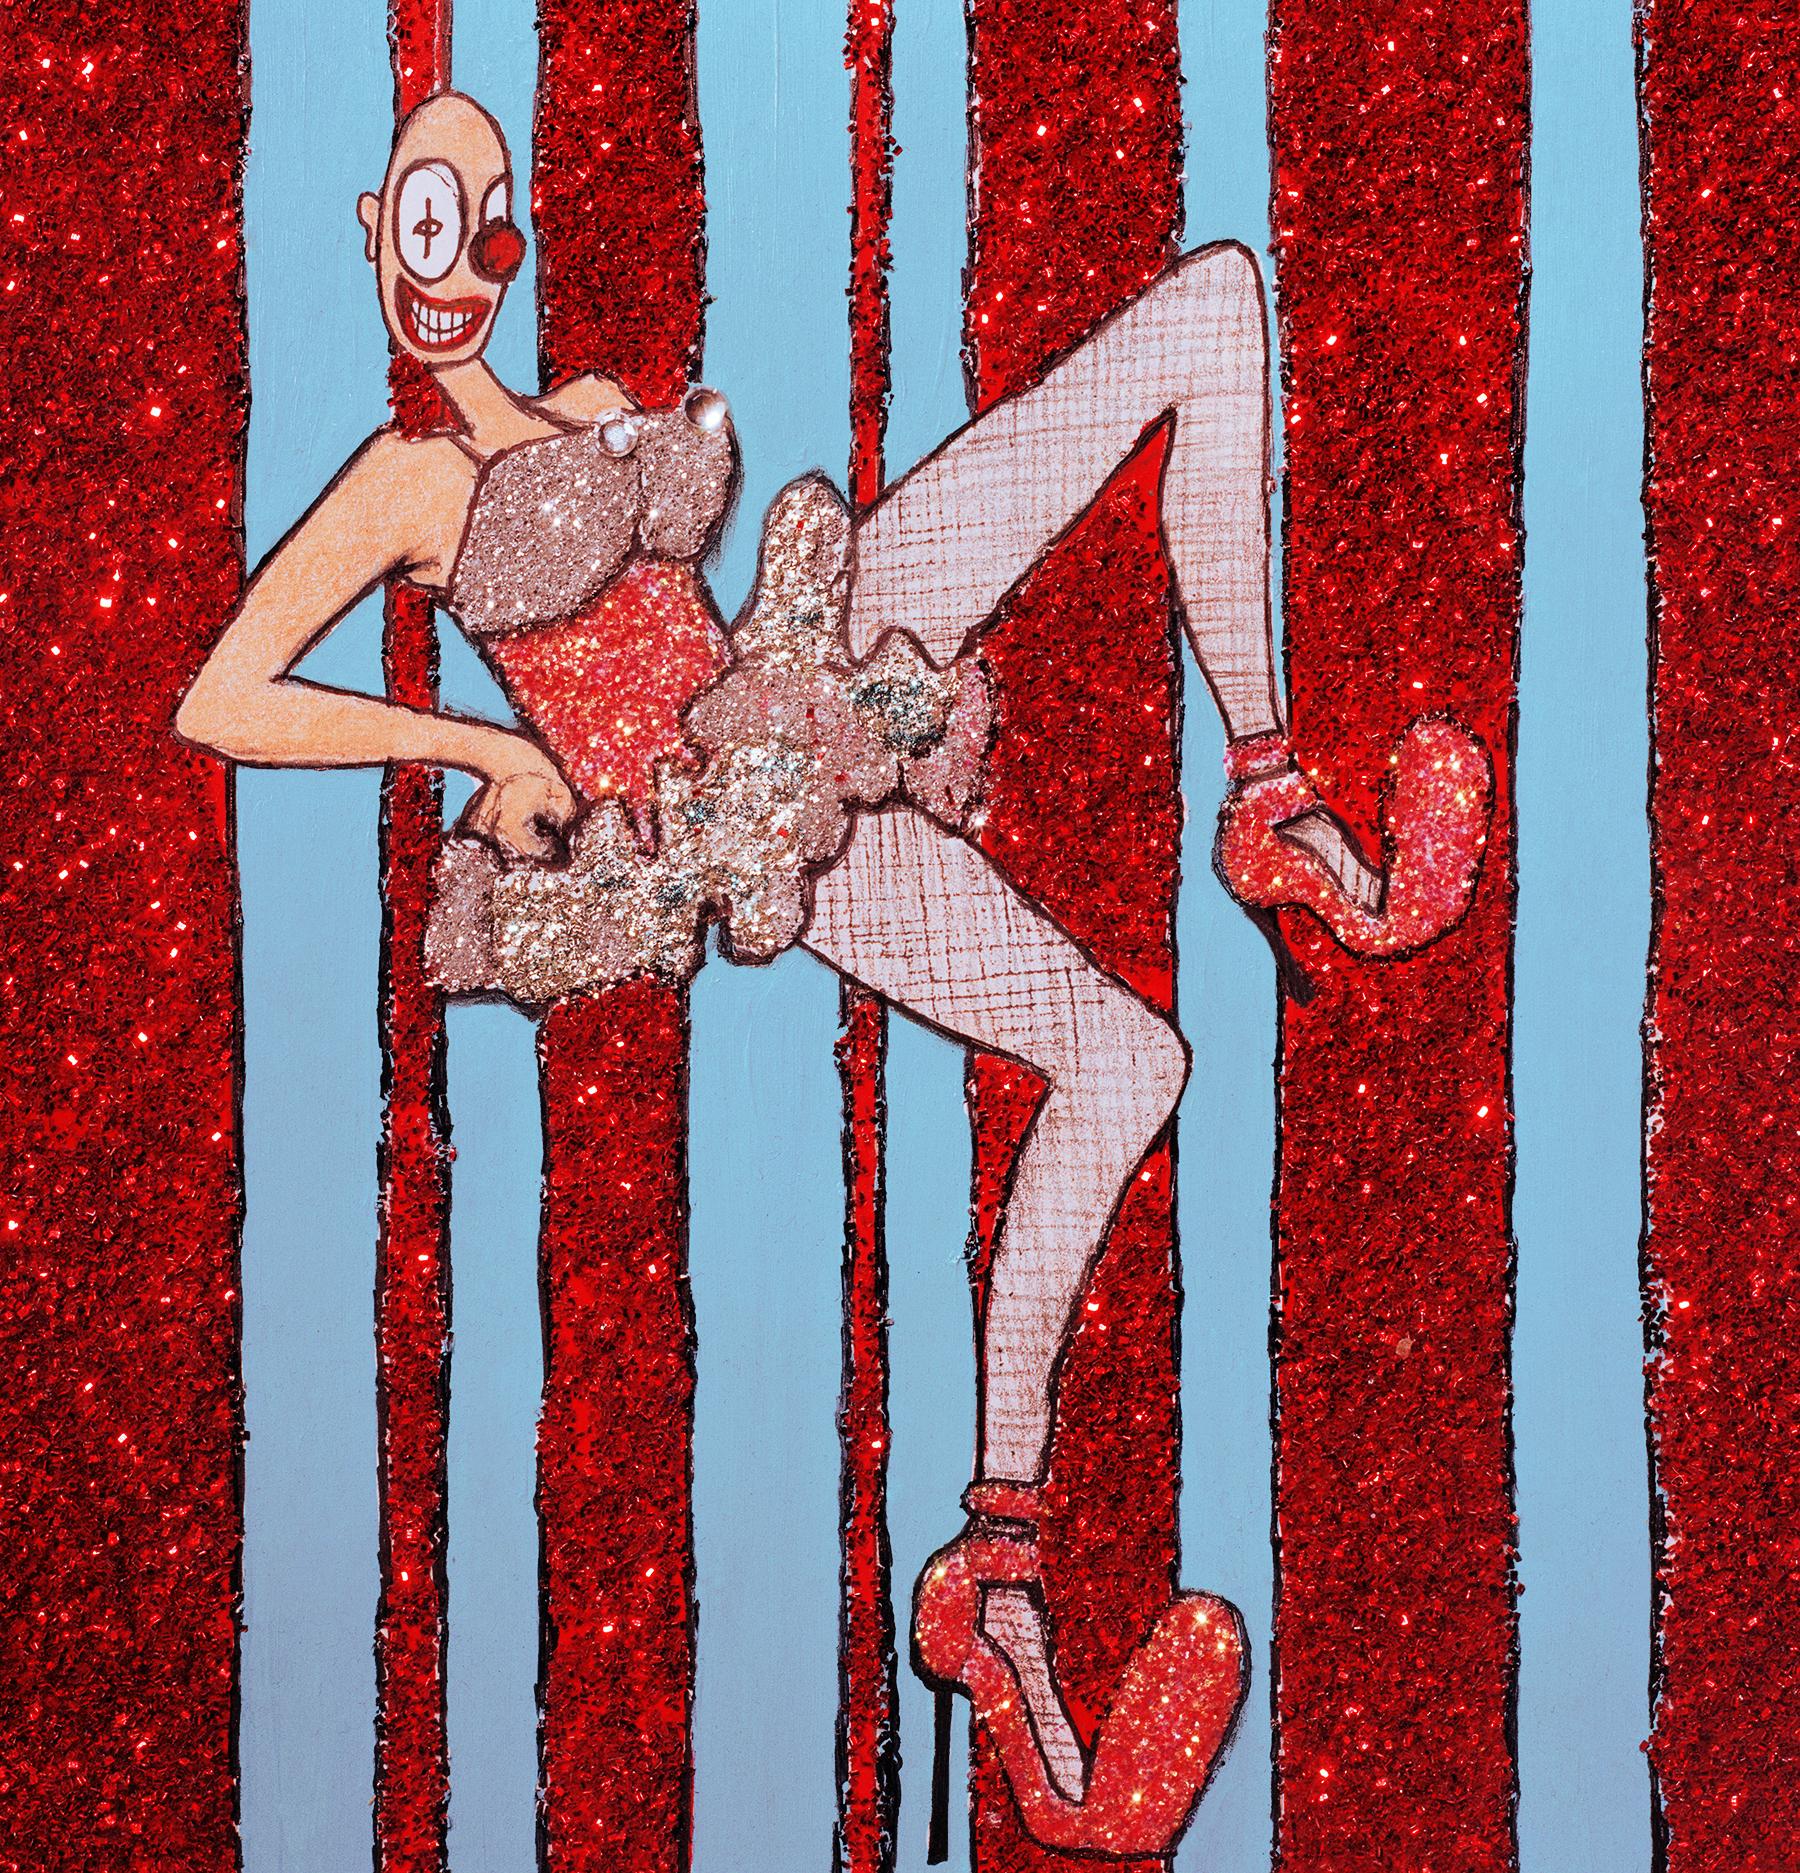 06_2003_dancing_glitter_clown.jpg